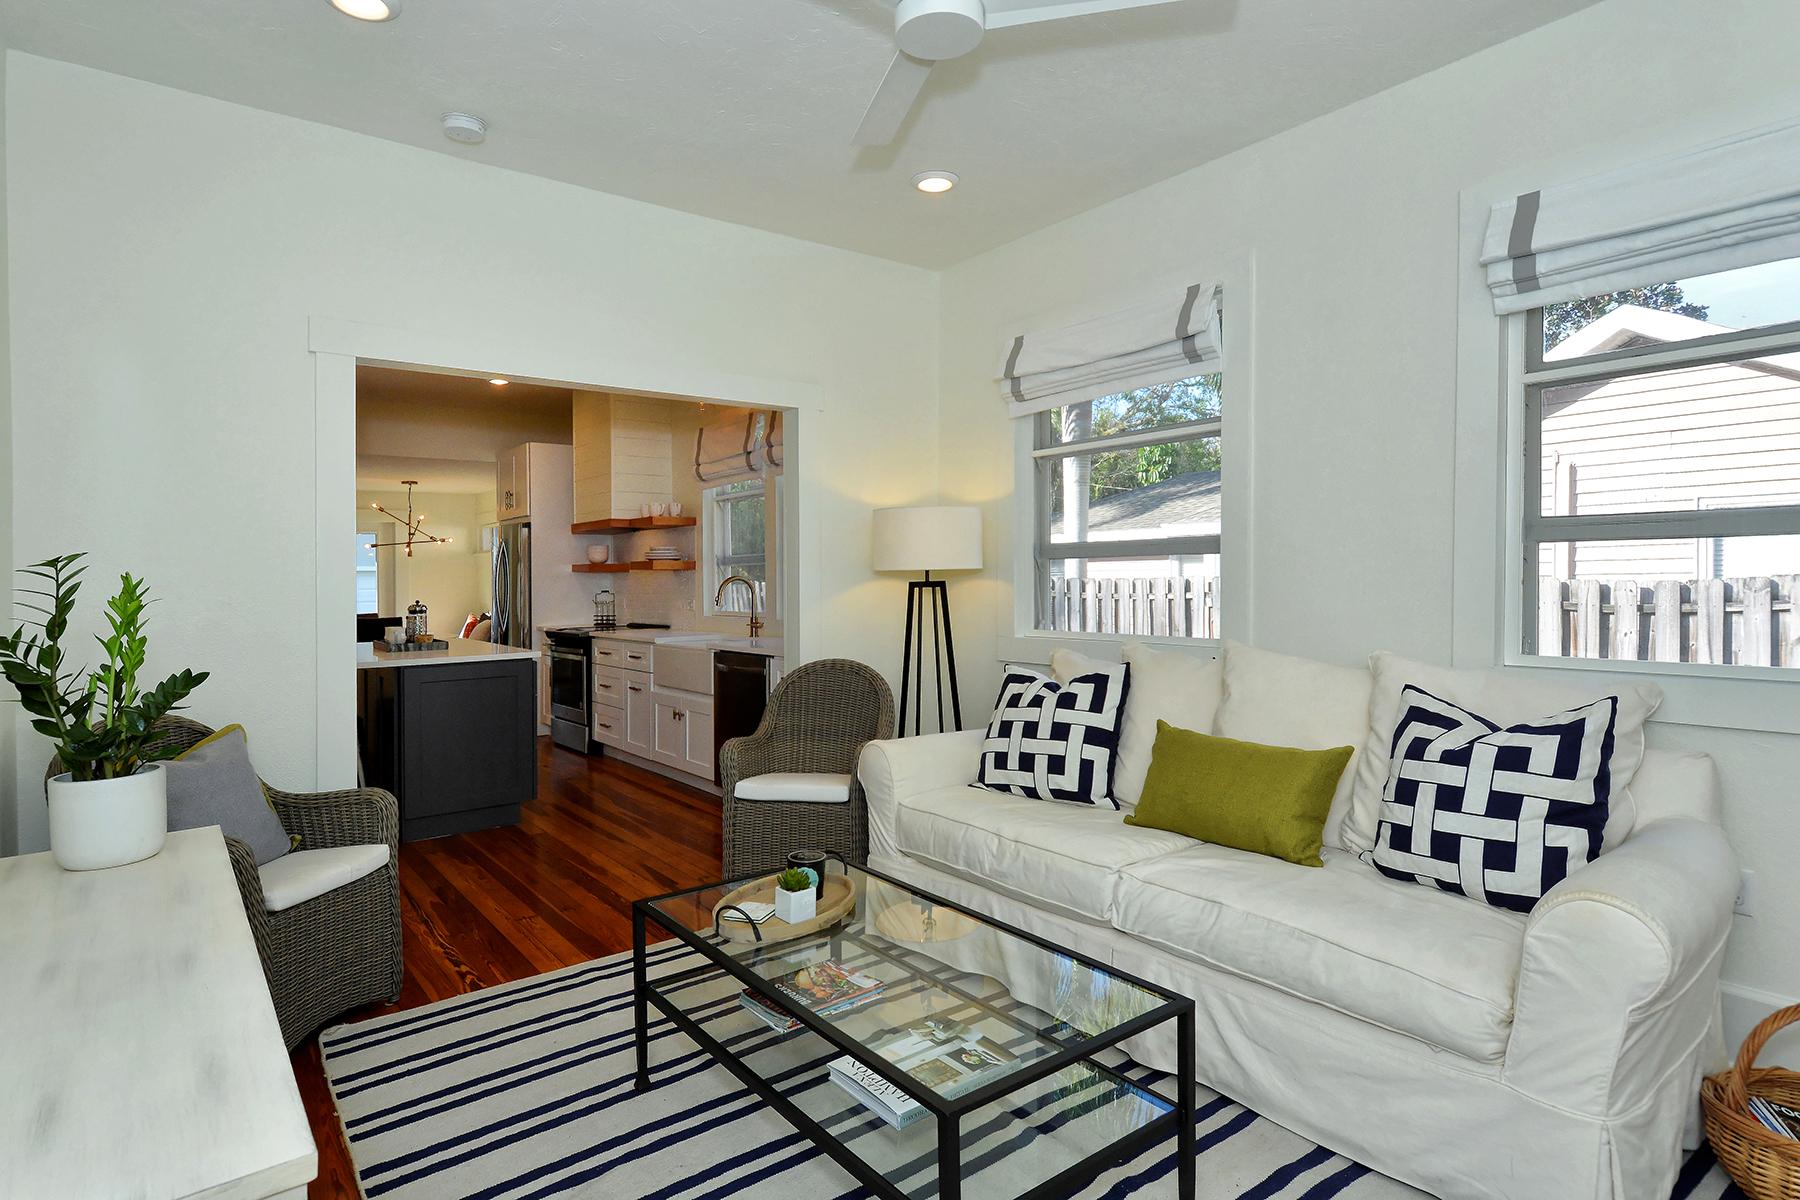 Additional photo for property listing at SARASOTA 1744  Irving St,  Sarasota, Florida 34236 United States